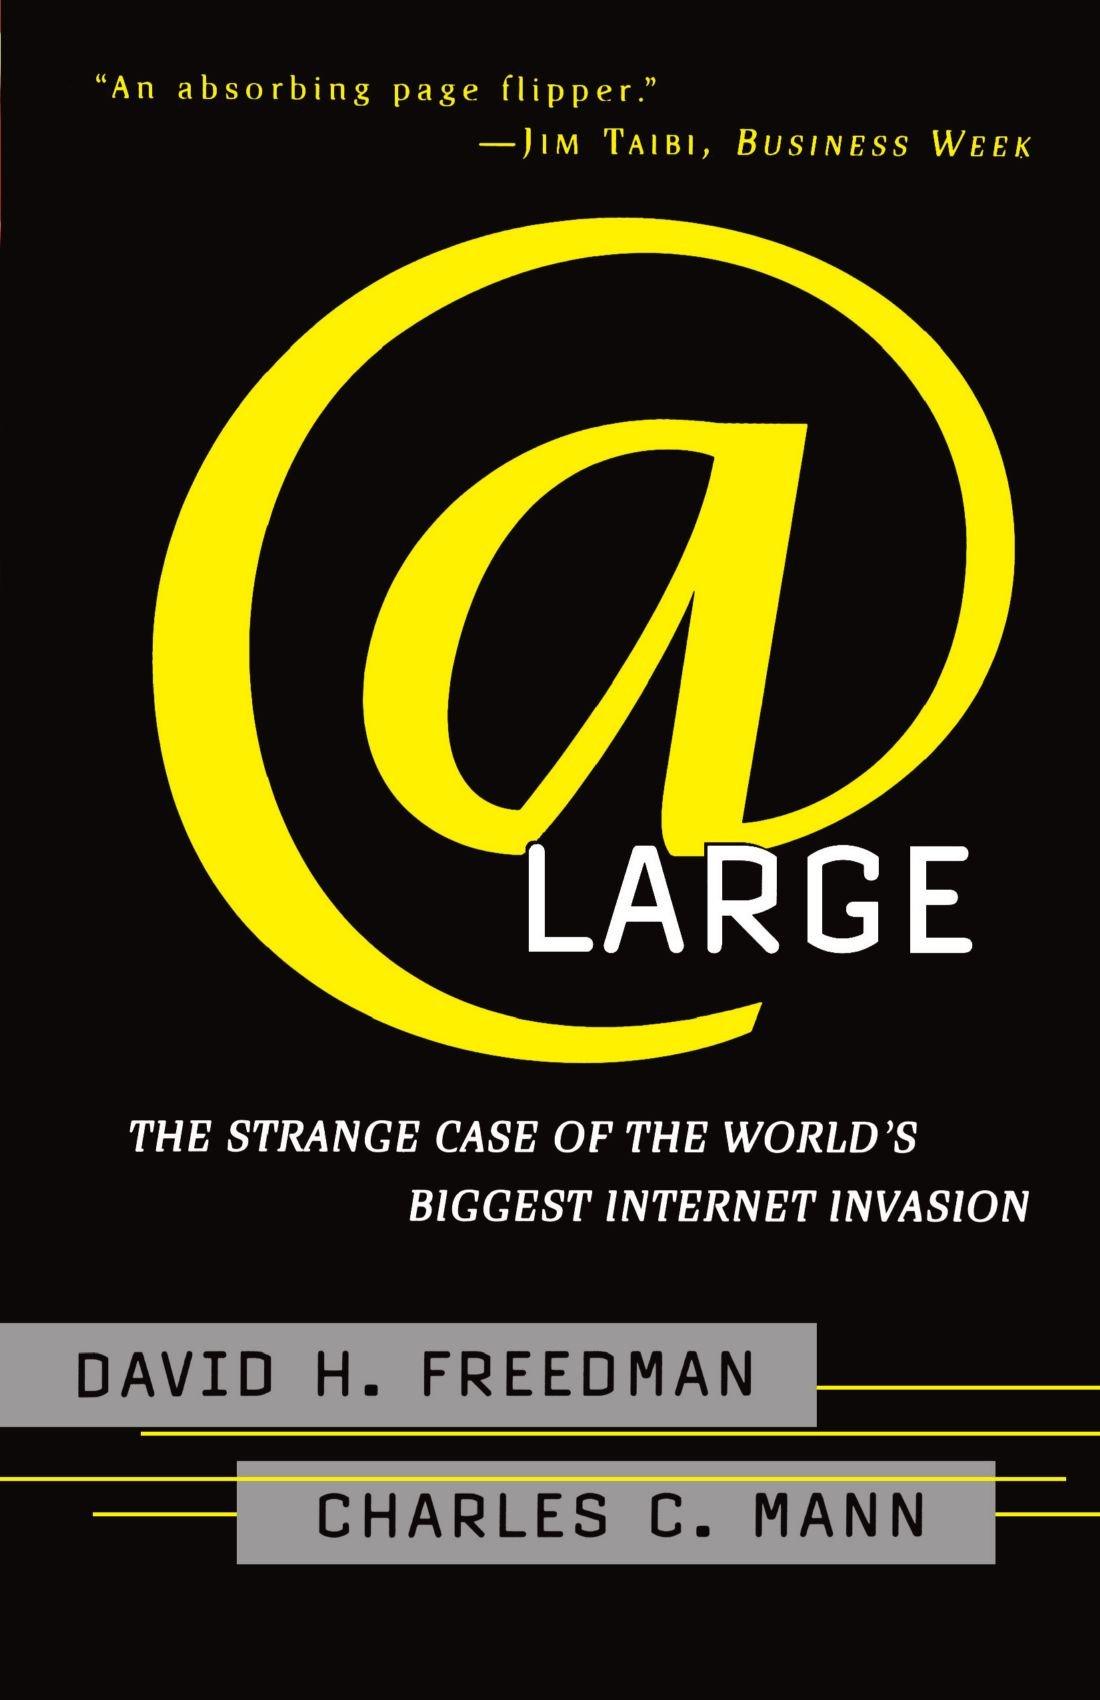 At Large: The Strange Case of the World's Biggest Internet Invasion: David H. Freedman, Charles C. Mann: 9780684835587: Amazon.com: Books